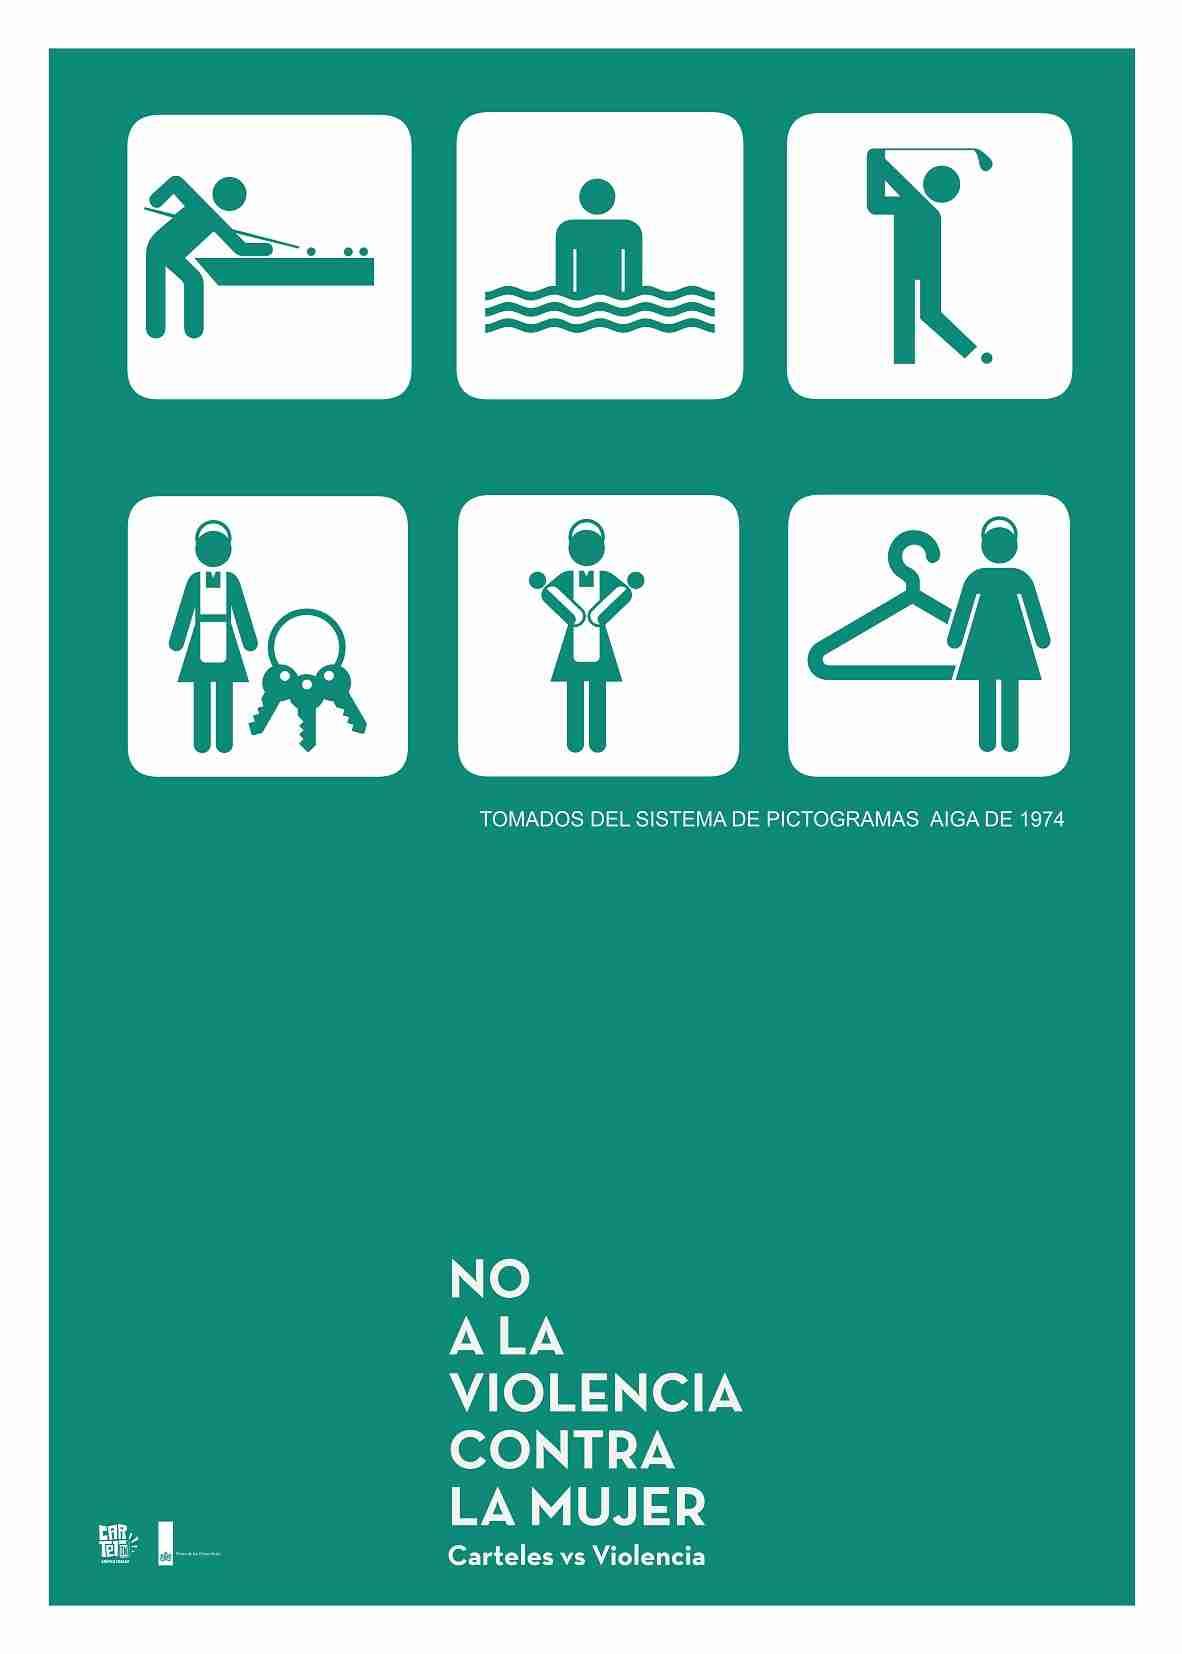 Obra: No a la violencia contra la mujer.